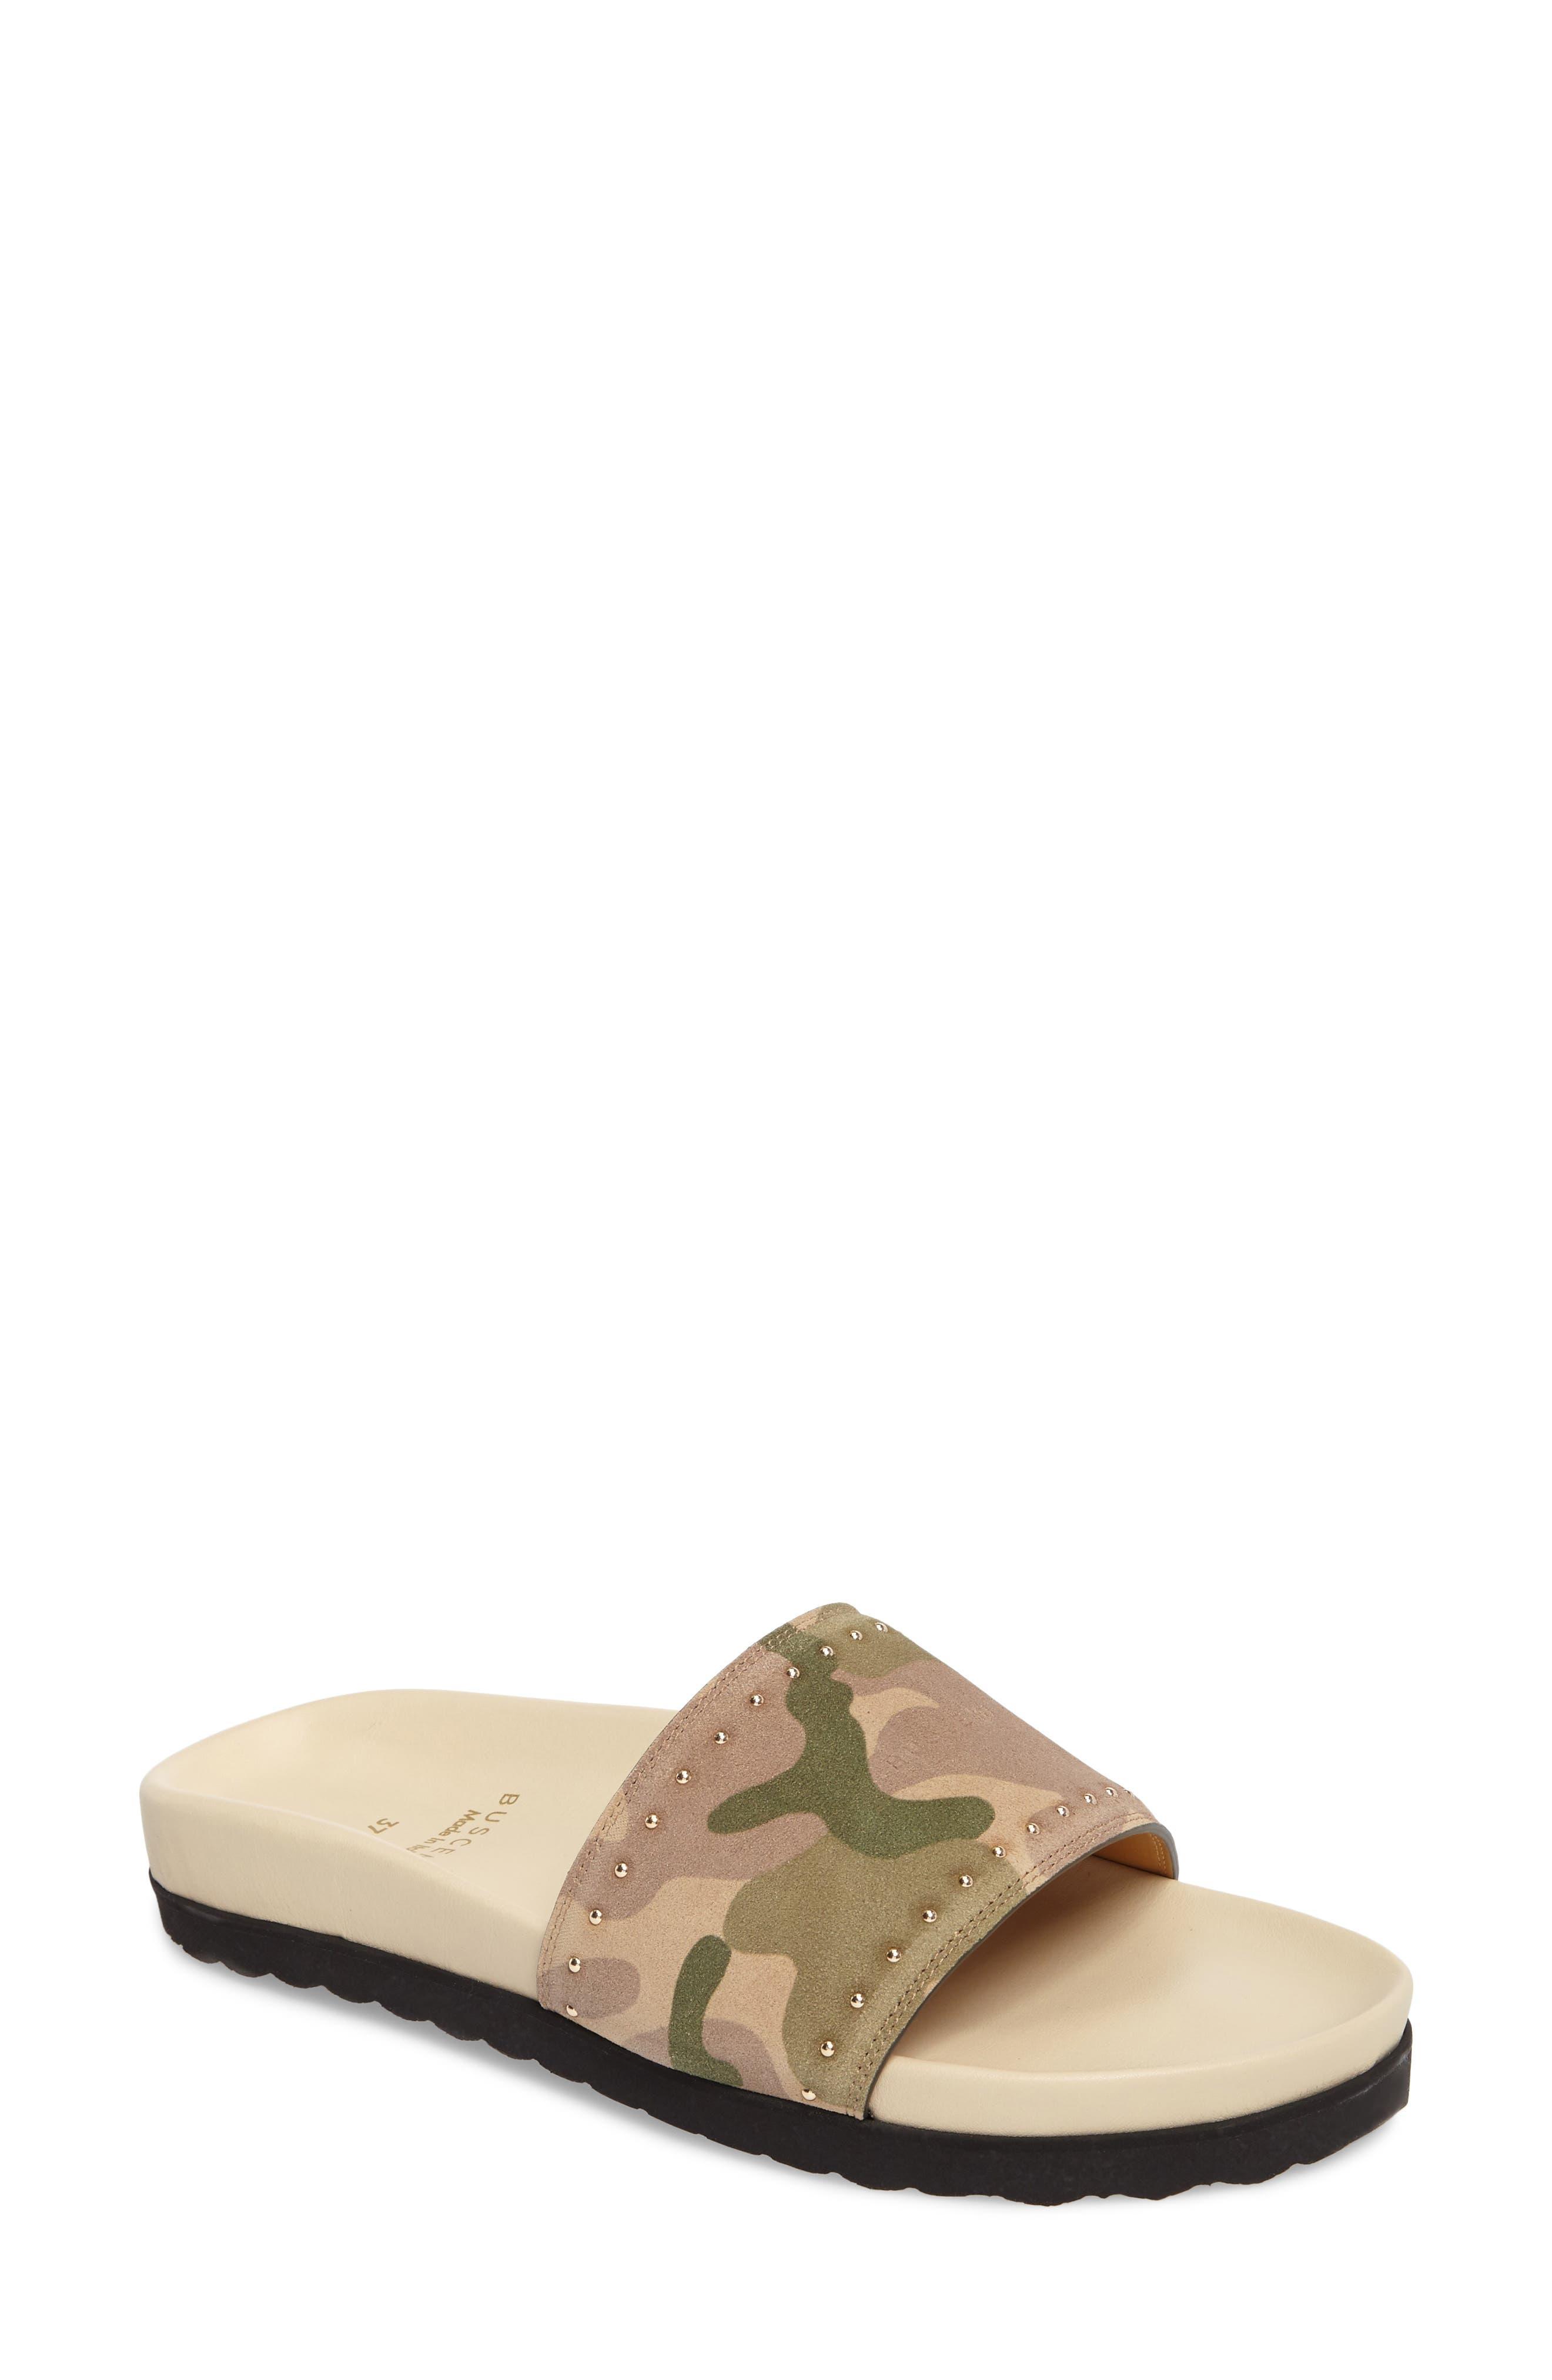 Camo Slide Sandal,                         Main,                         color, Camou